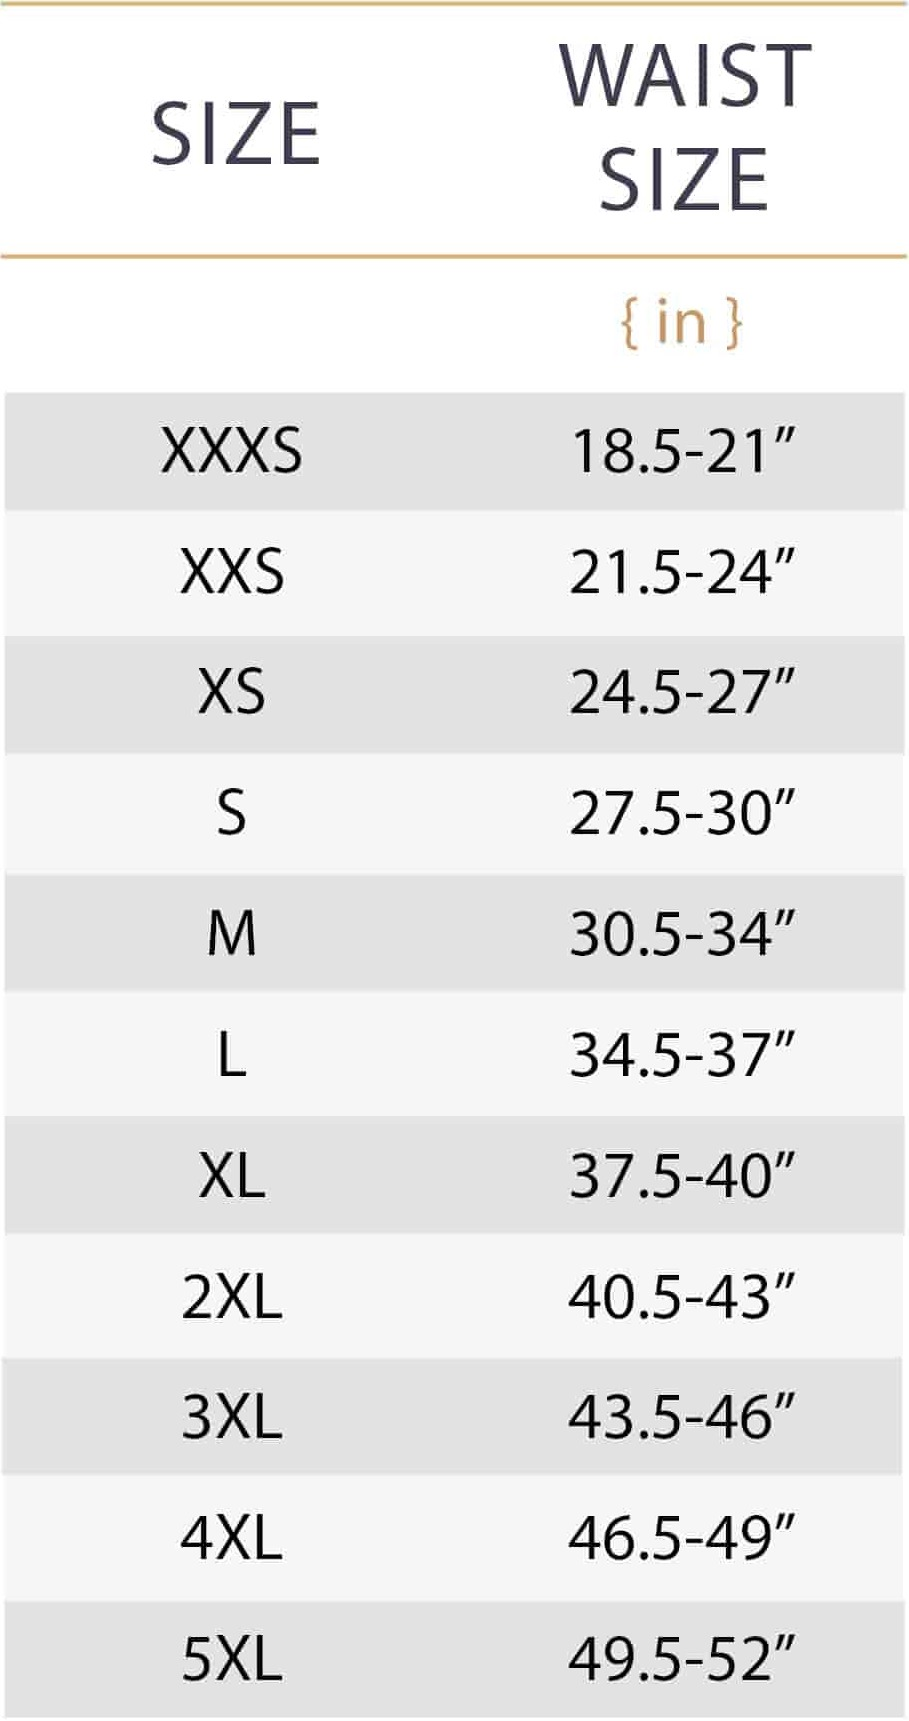 hga-size-chart-waist-xxs-5xl.jpg